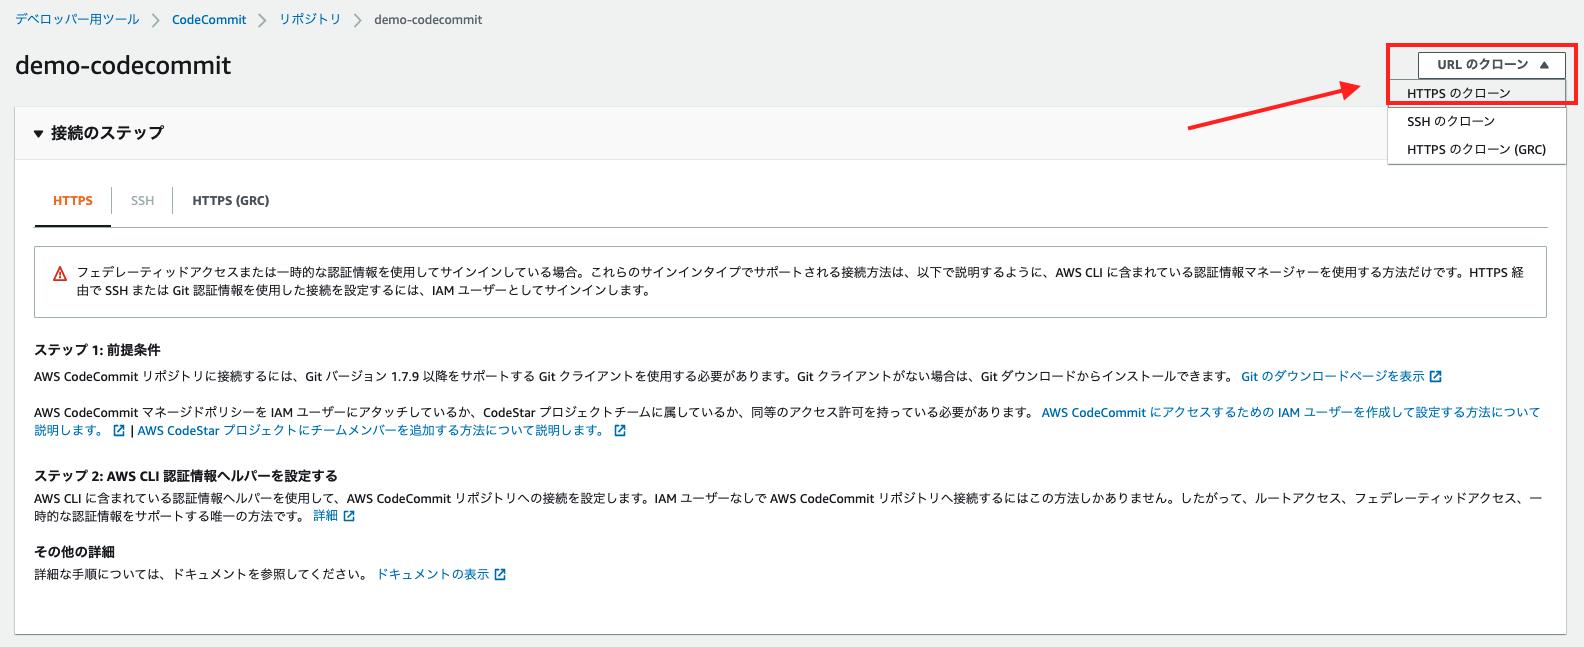 https://cdn-ssl-devio-img.classmethod.jp/wp-content/uploads/2021/06/Untitled-1-1.png